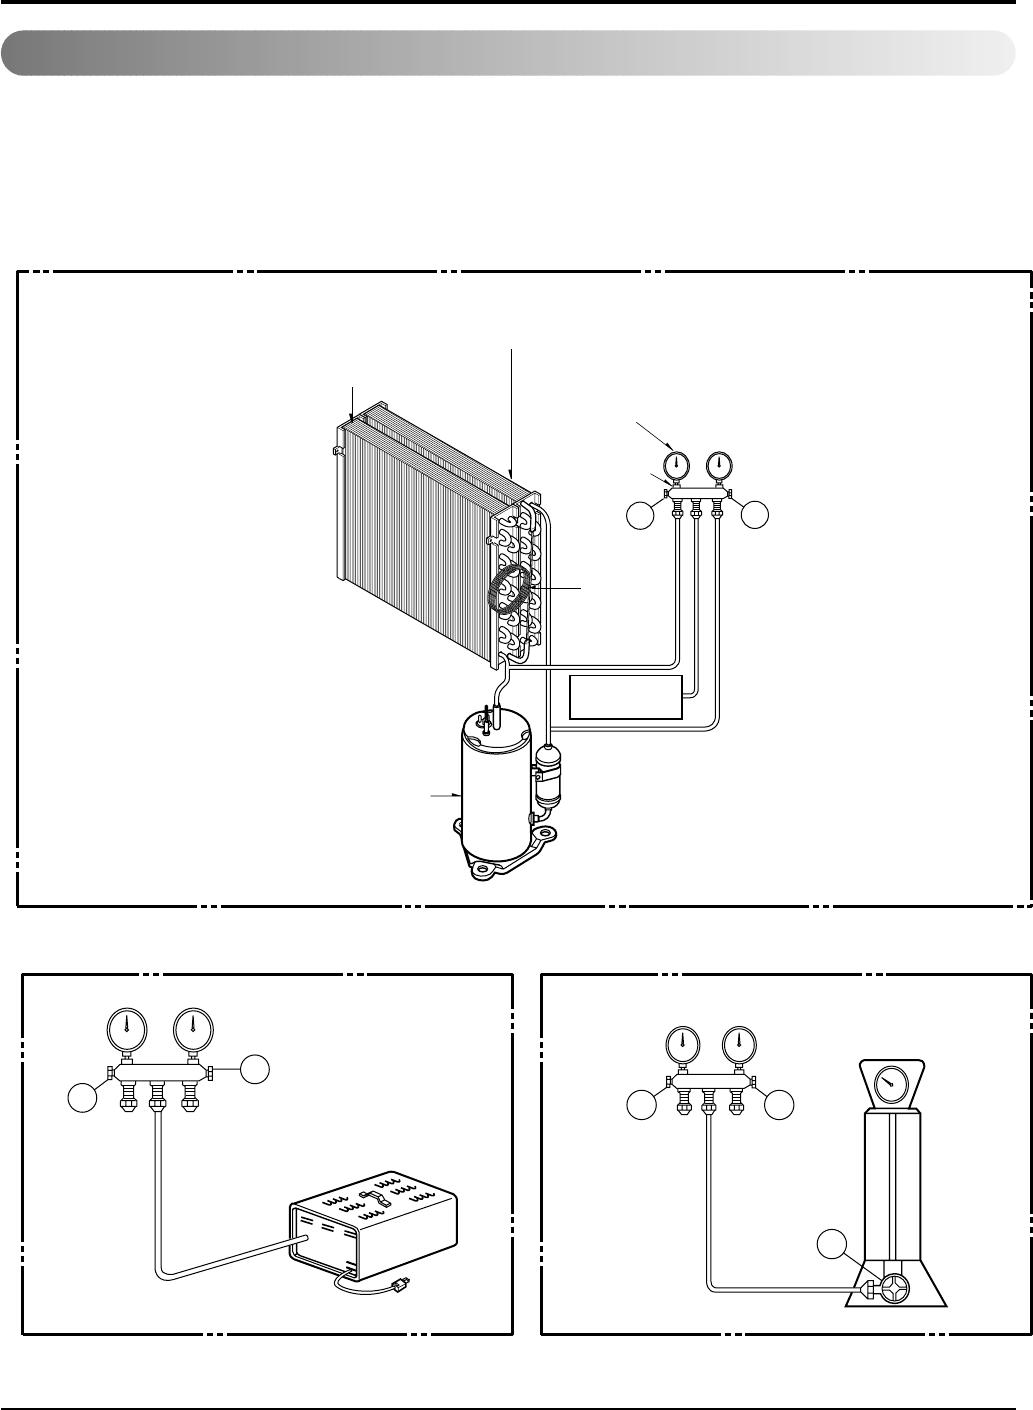 Pdf Repear Manual Zd30 Sabre Lawn Mower Belt Diagram Http Wwwjustanswercom Smallengine Array Lg Dehumidifier Users Twc096cbmk1 Rh Usermanual Wiki